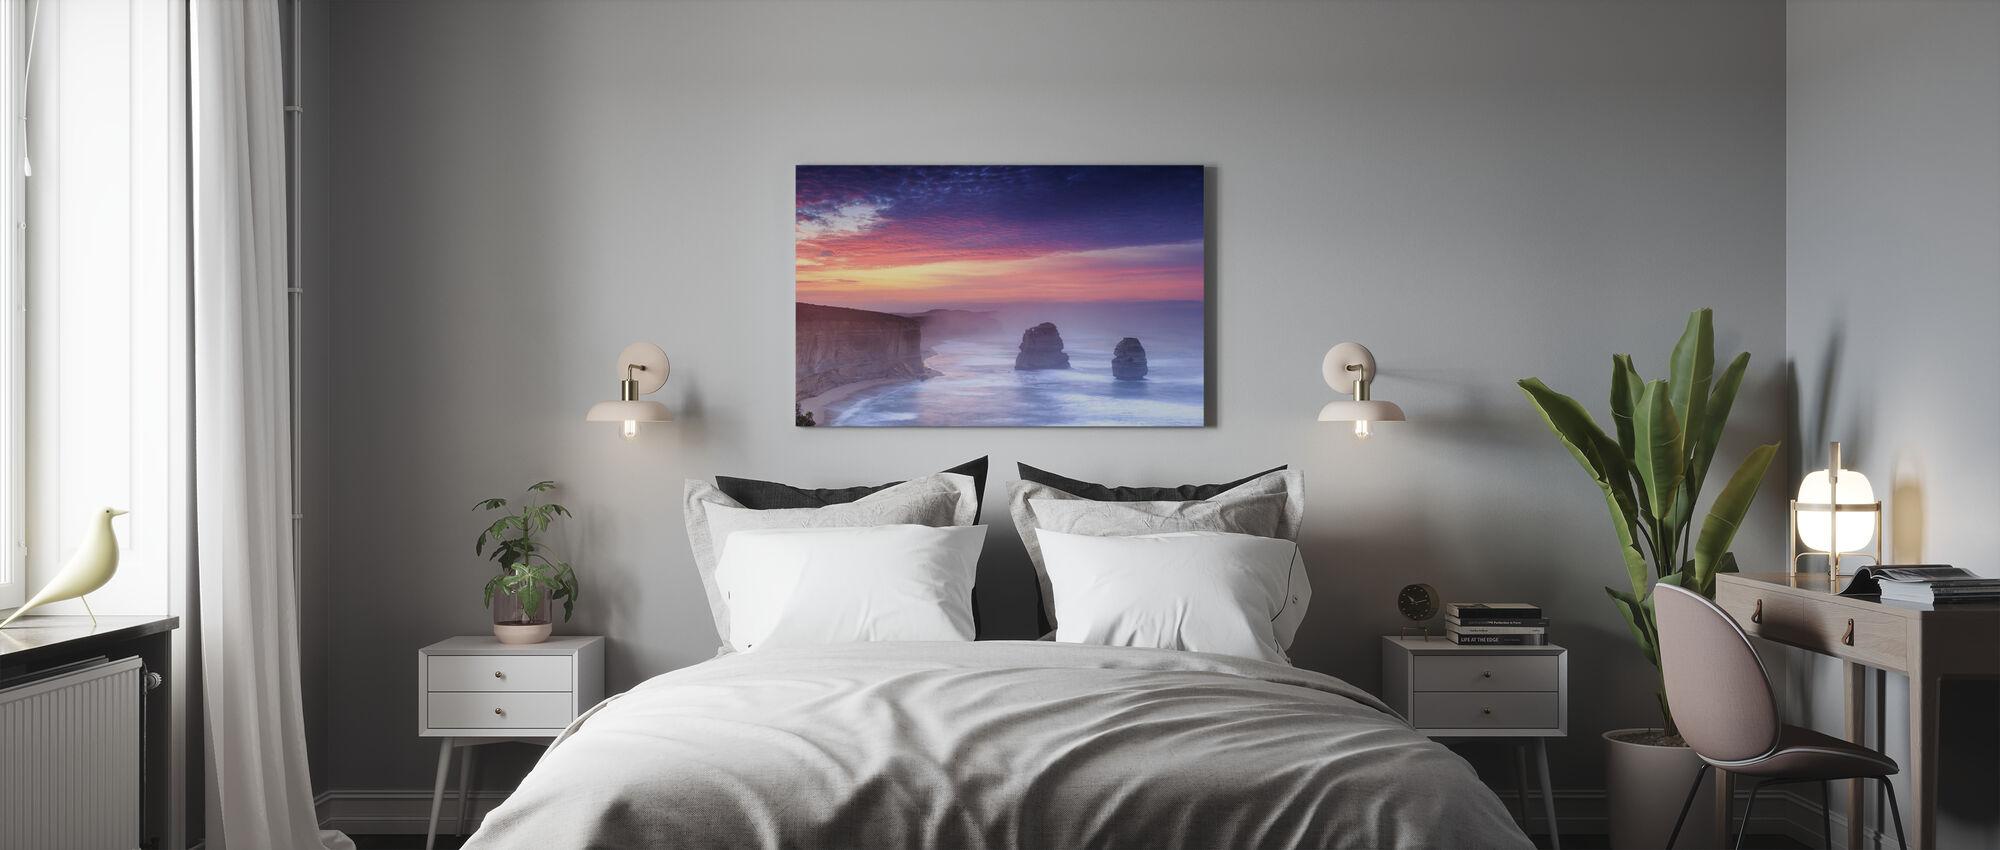 Australian Strandlinje - Canvastavla - Sovrum